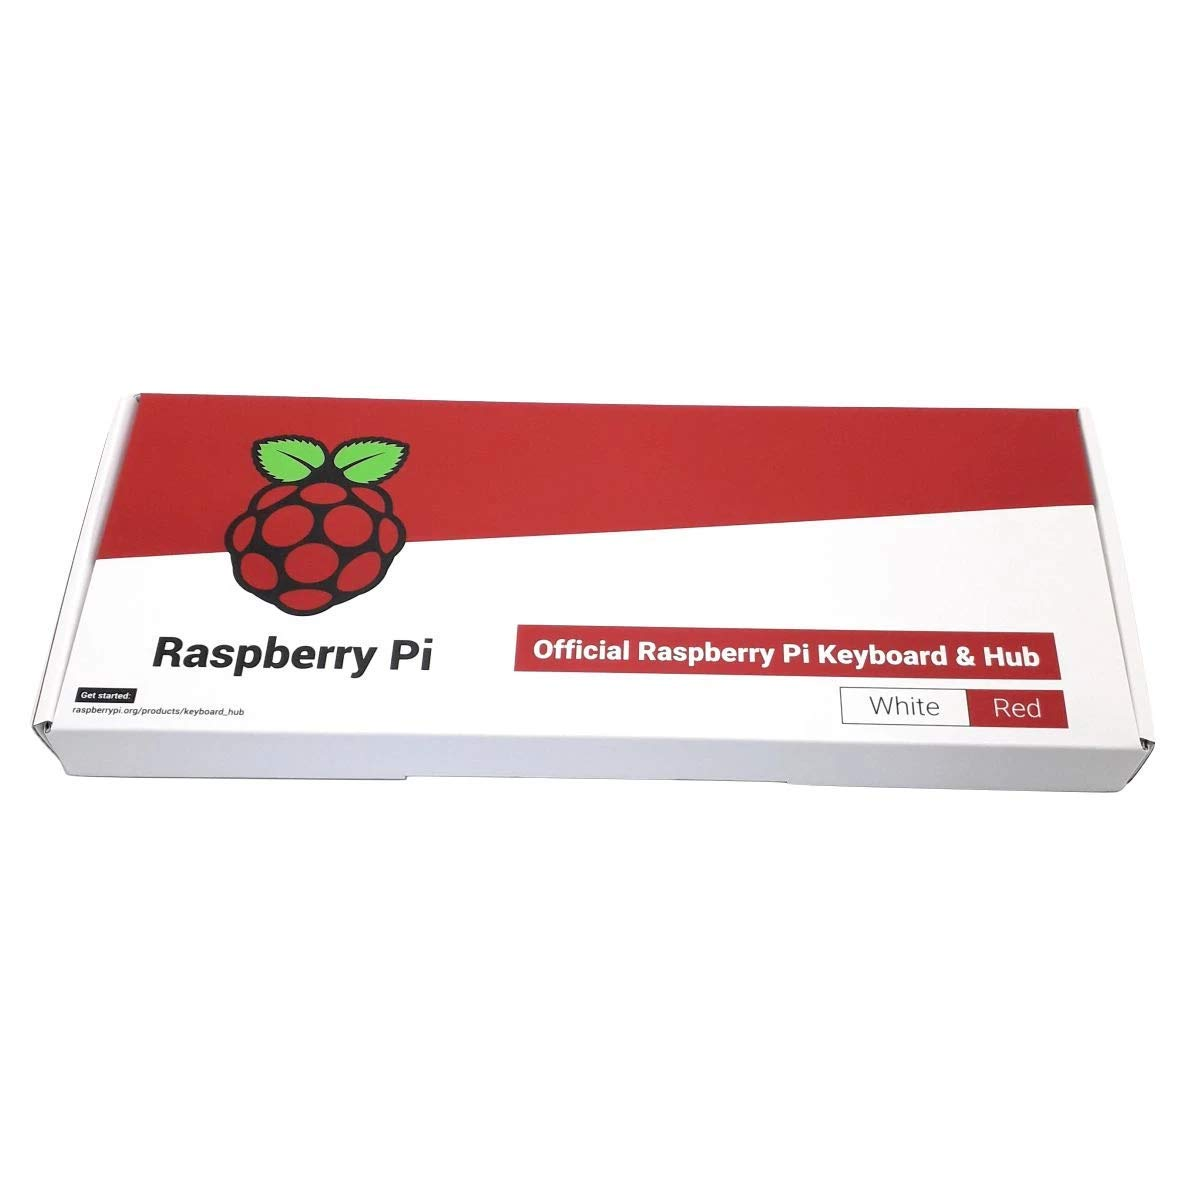 versi/ón espa/ñola Rojo//Blanco Teclado Oficial Raspberry Pi